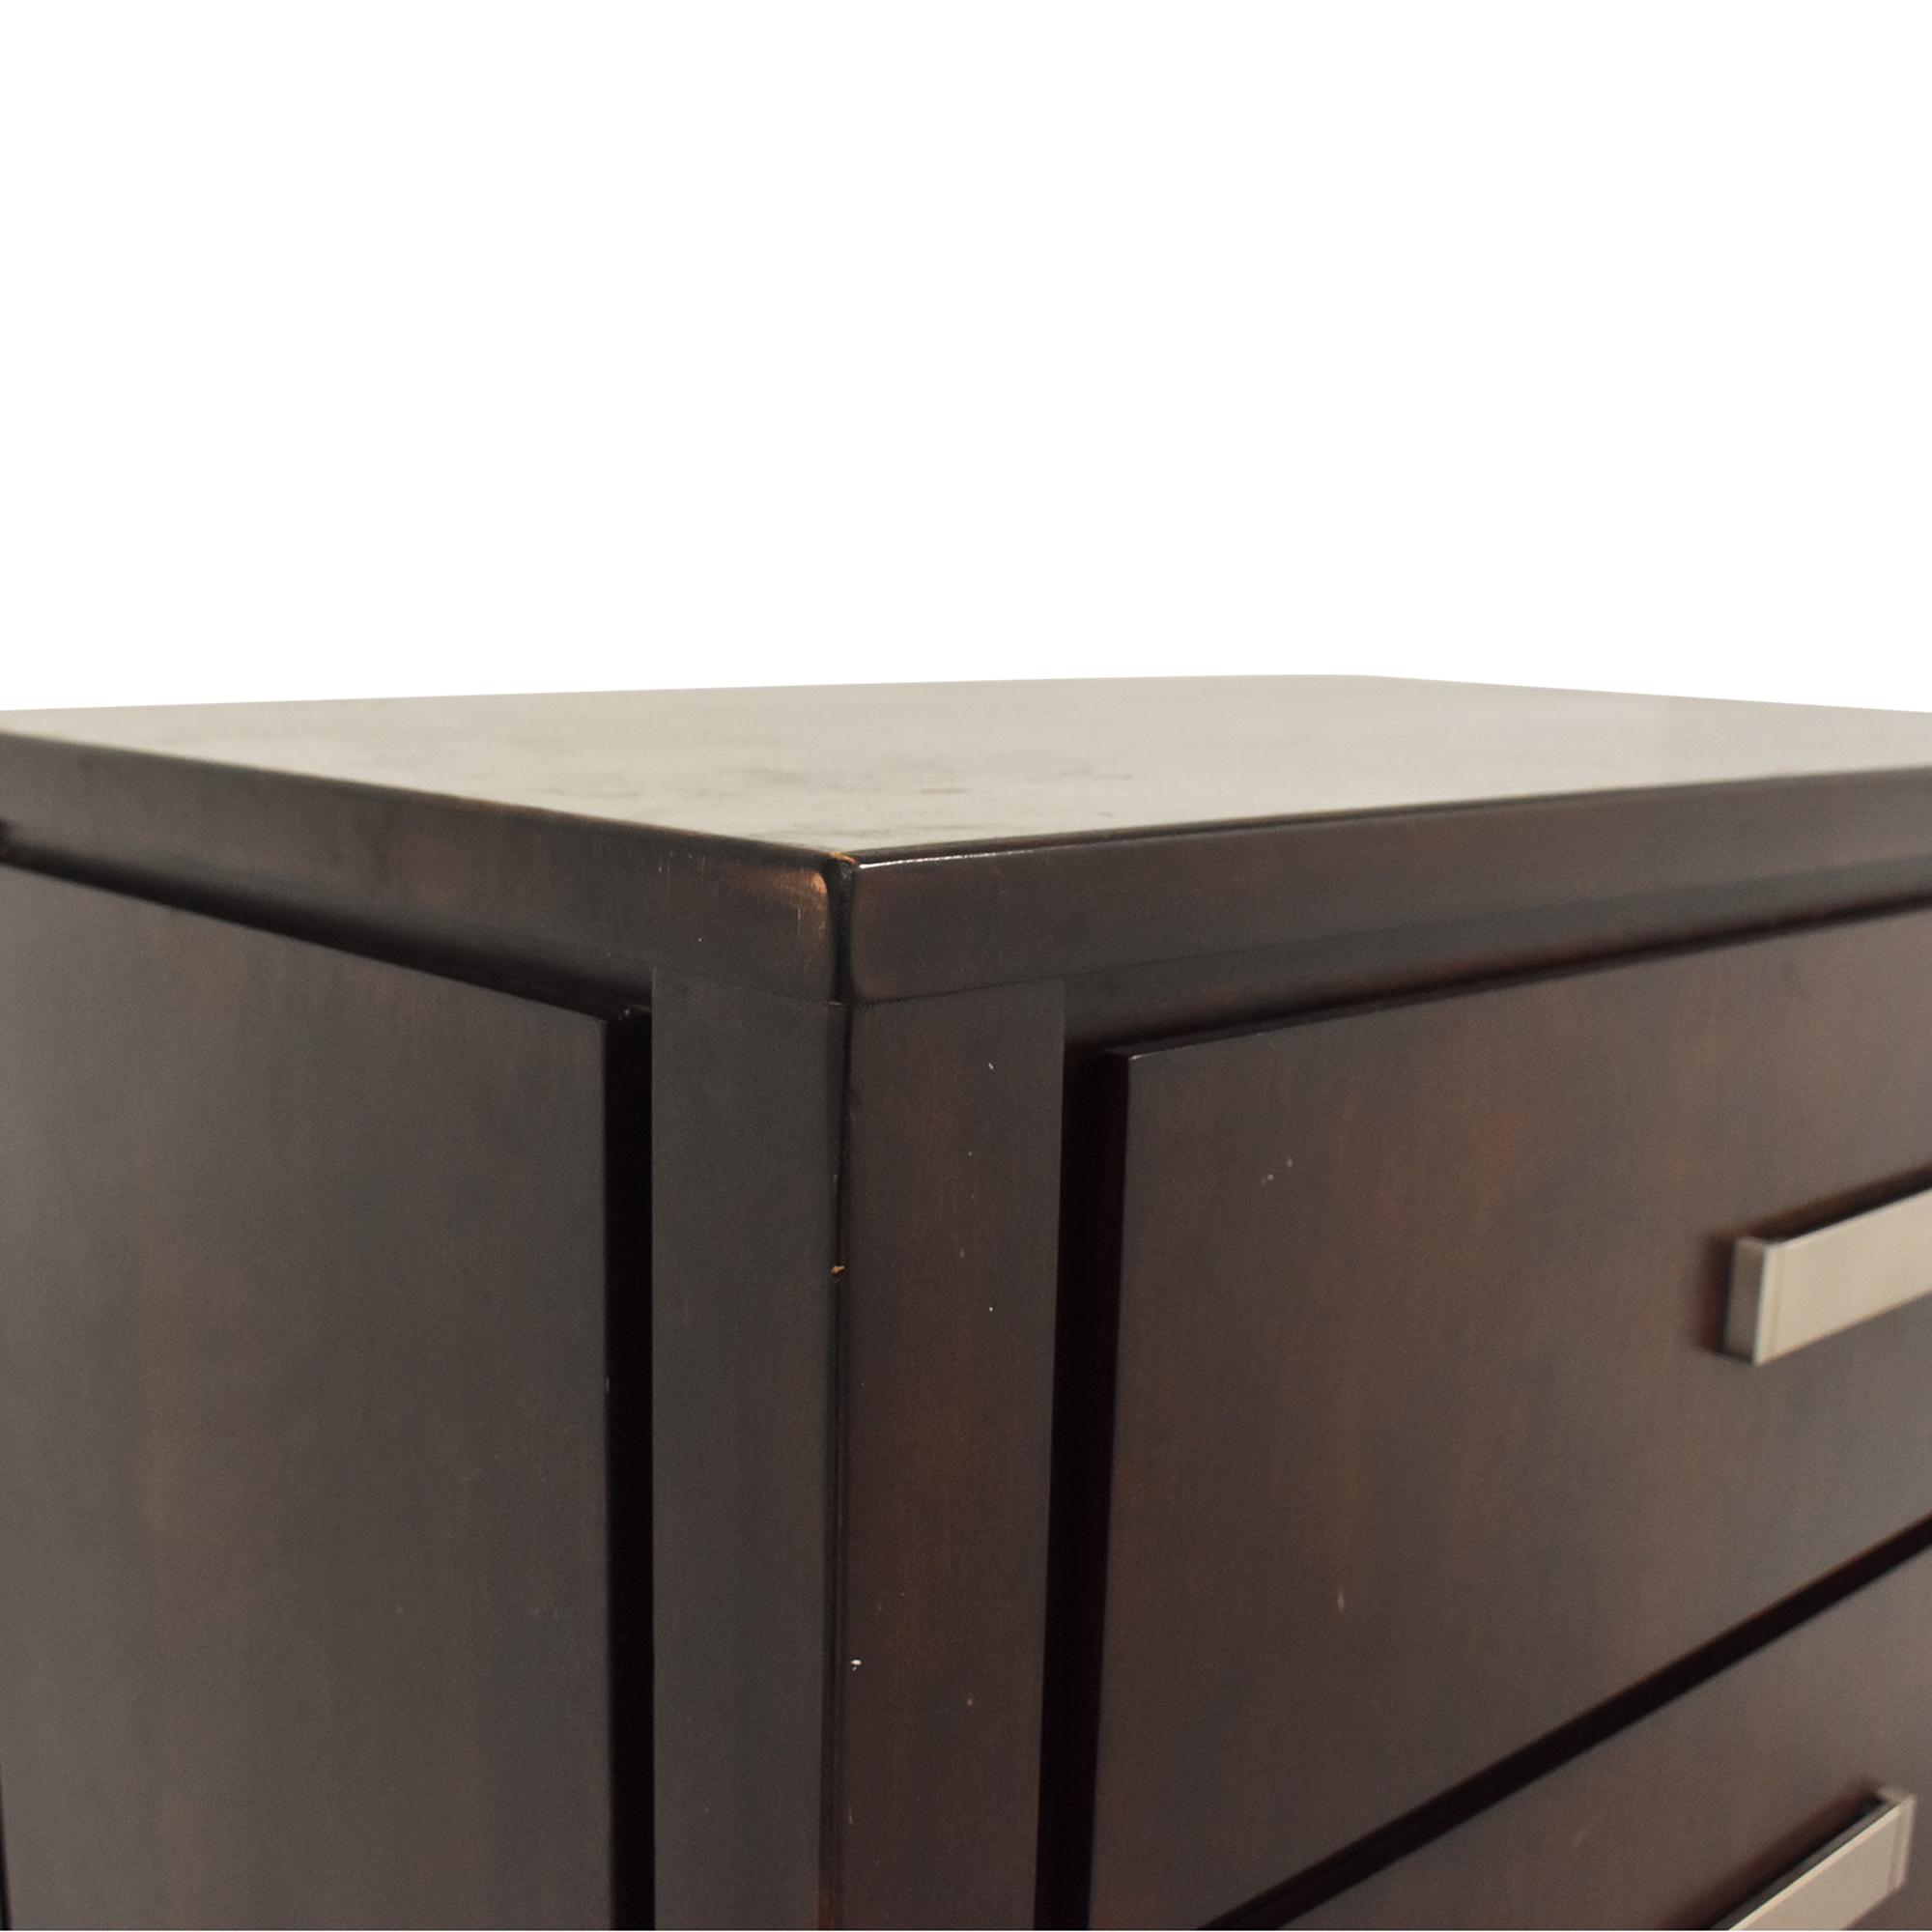 Raymour & Flanigan Raymour & Flanigan Tall Five Drawer Dresser ct